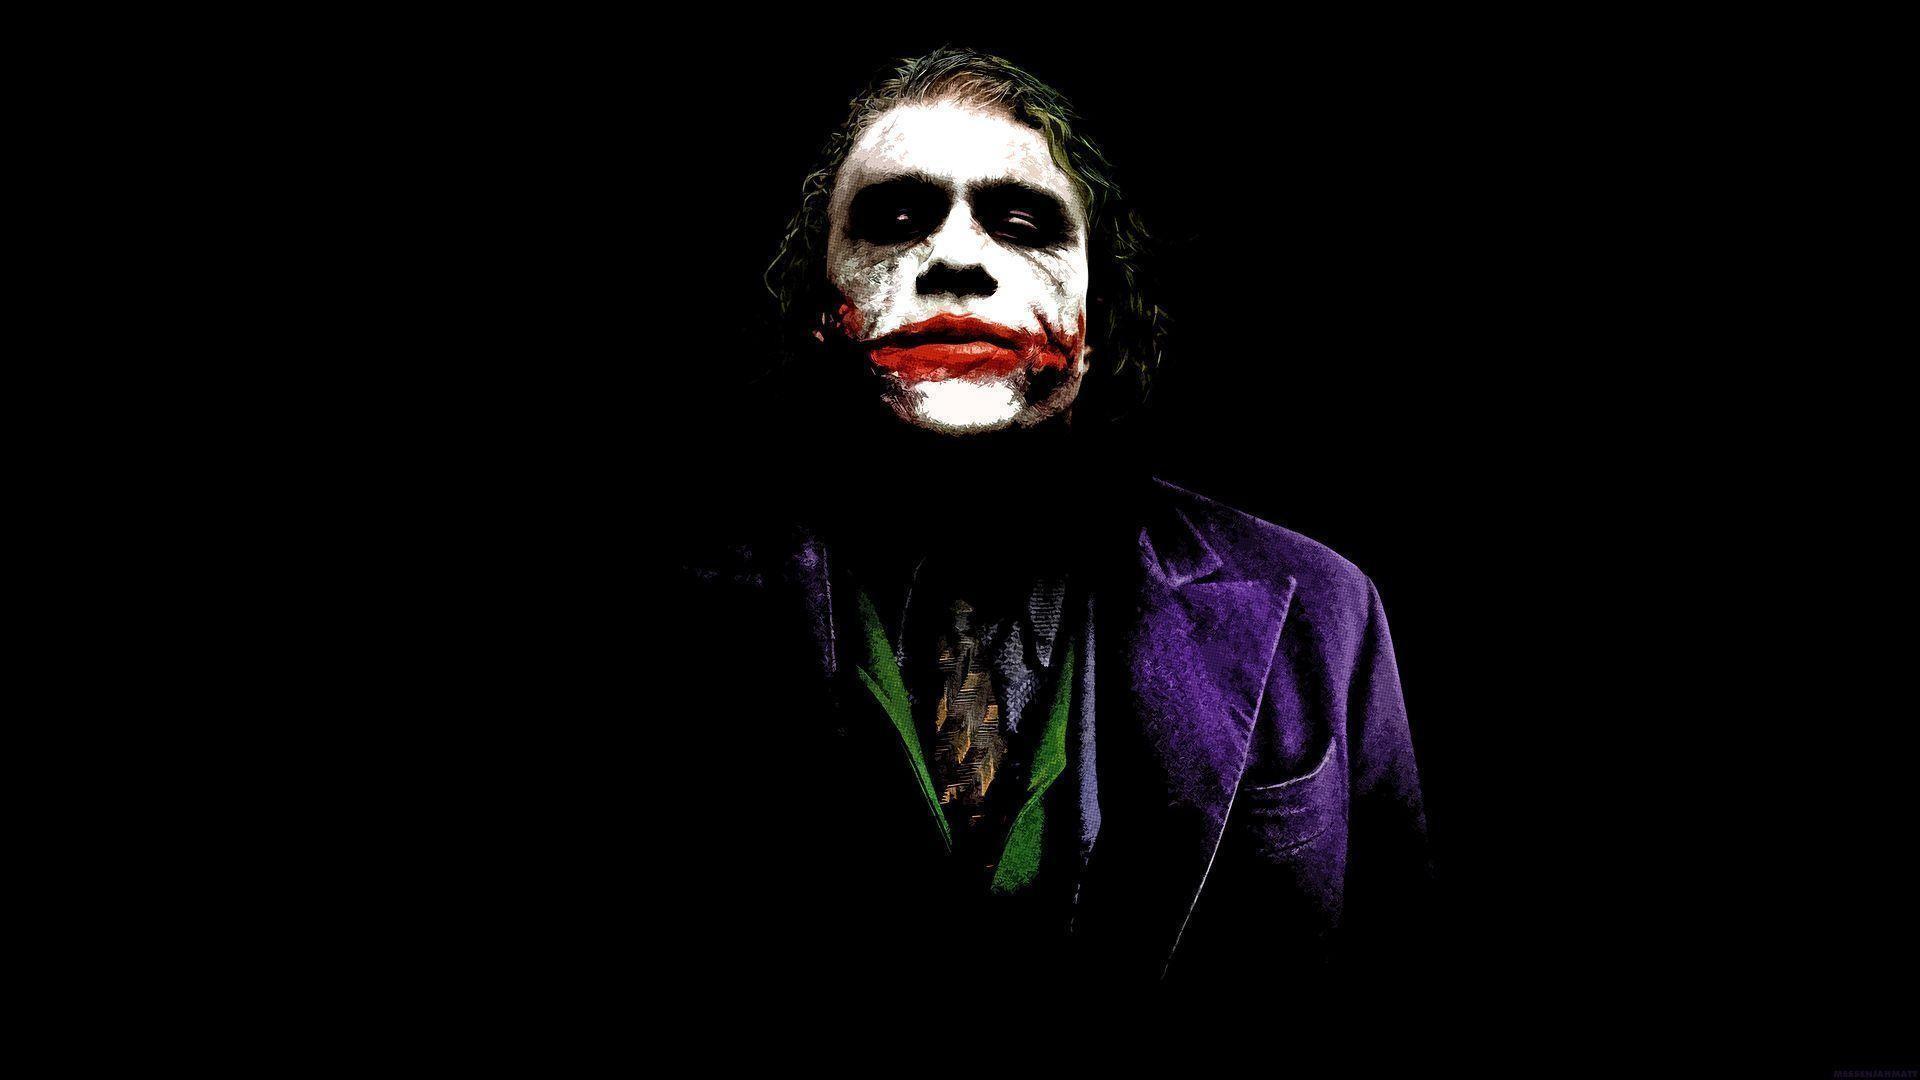 Joker HD Wallpapers – Wallpaper Cave · wallpapercave.com